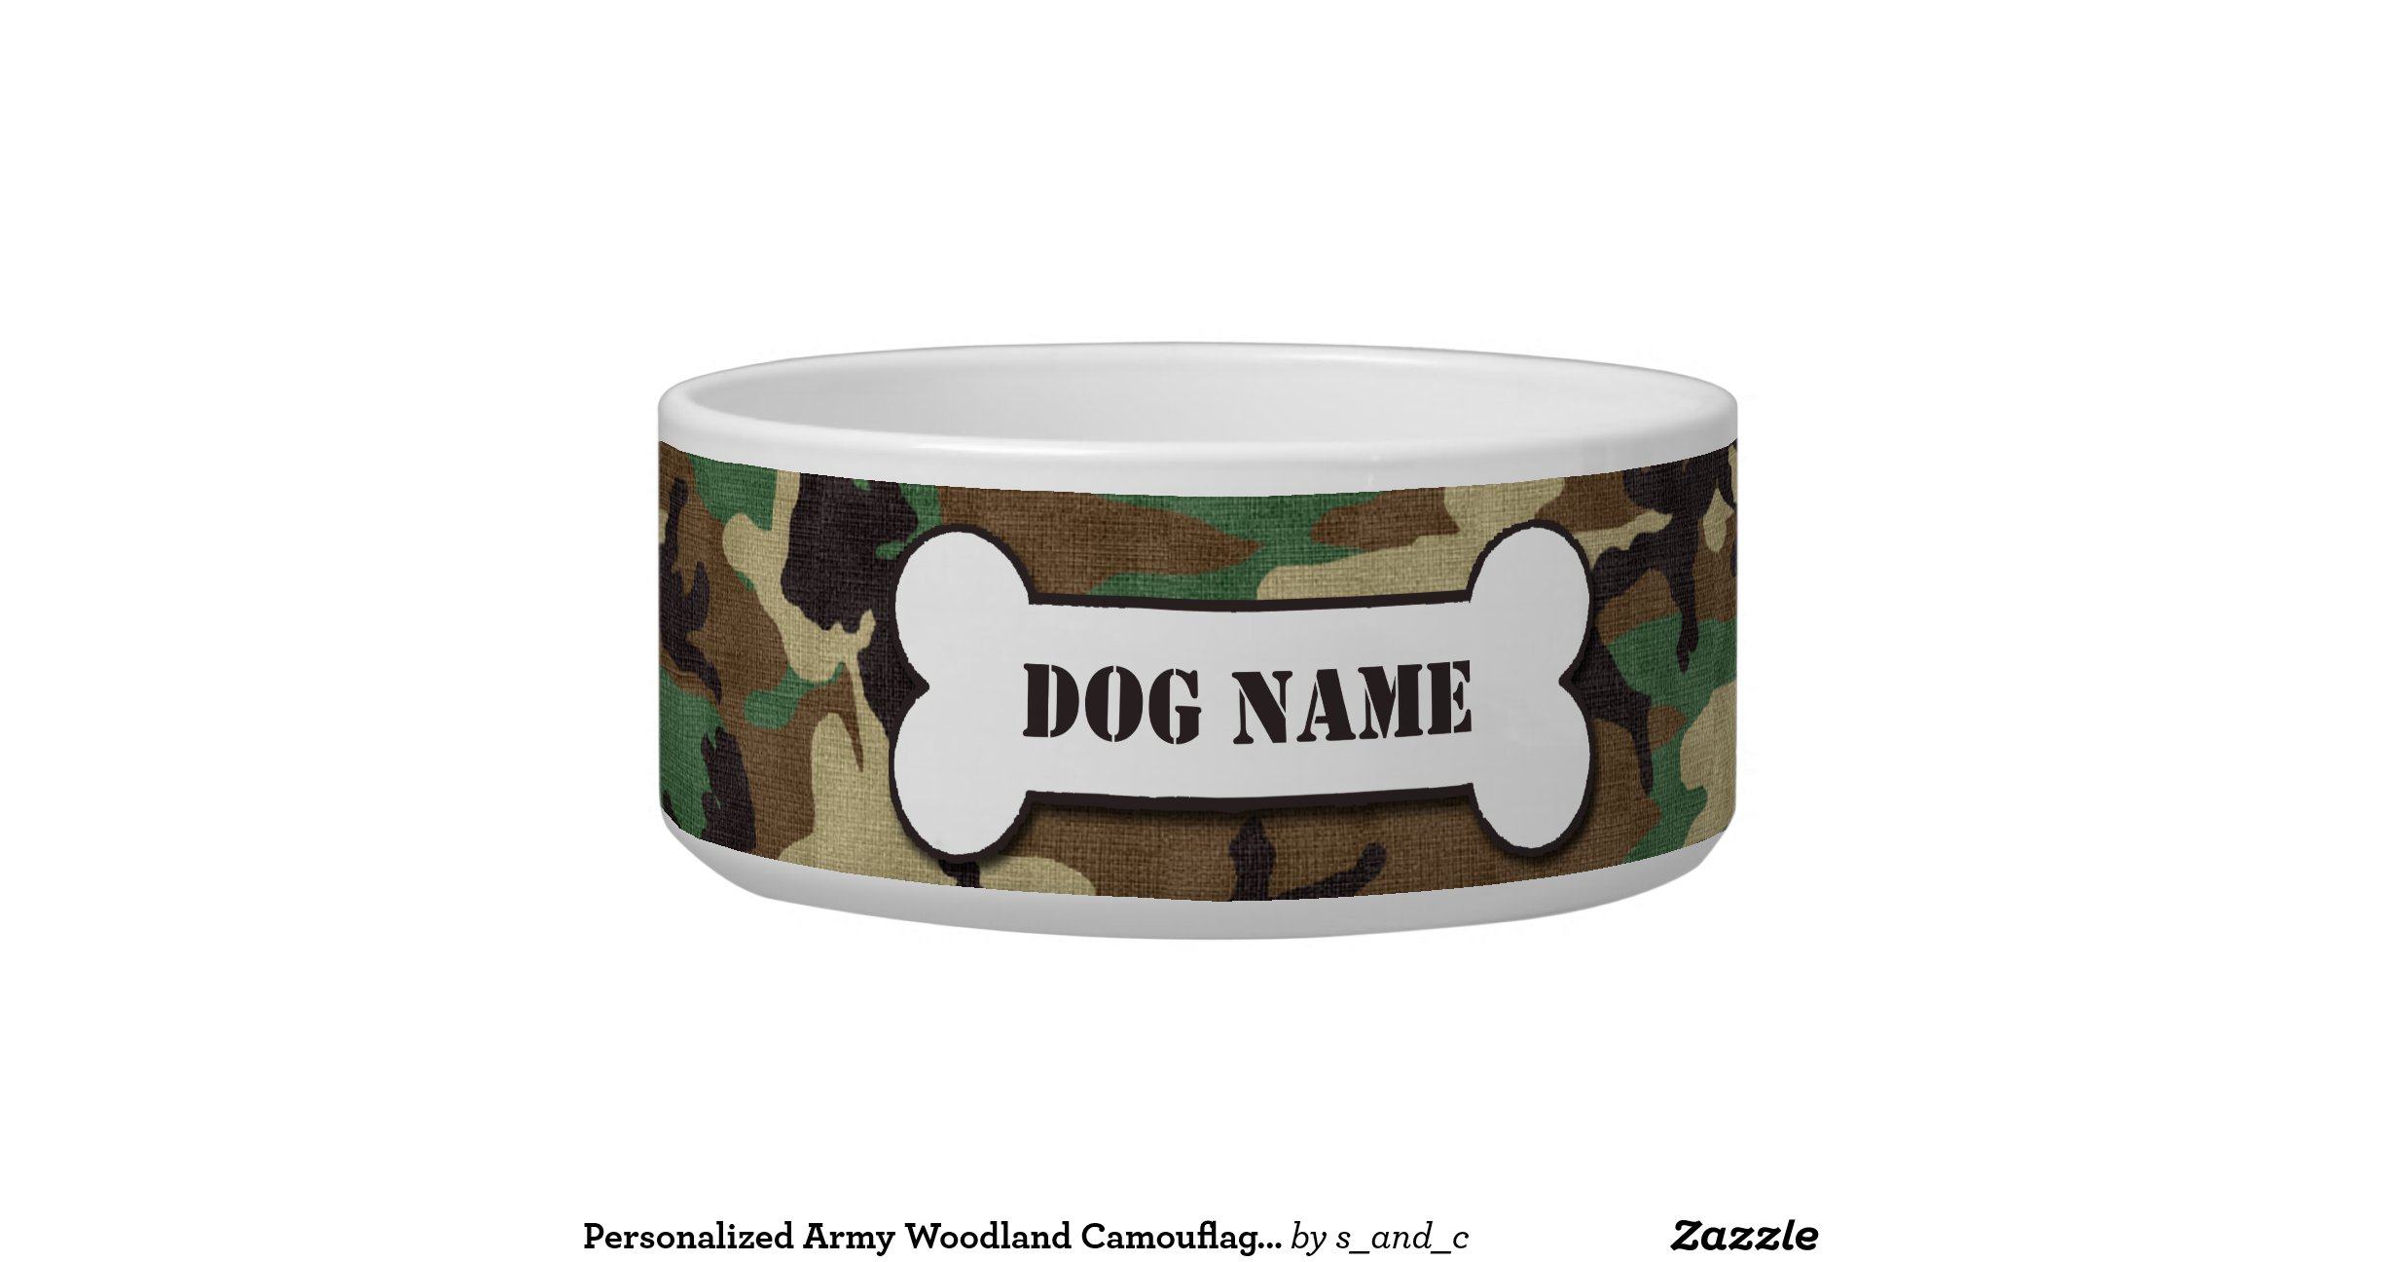 Personalized Army Woodland Camouflage Dog Bowl